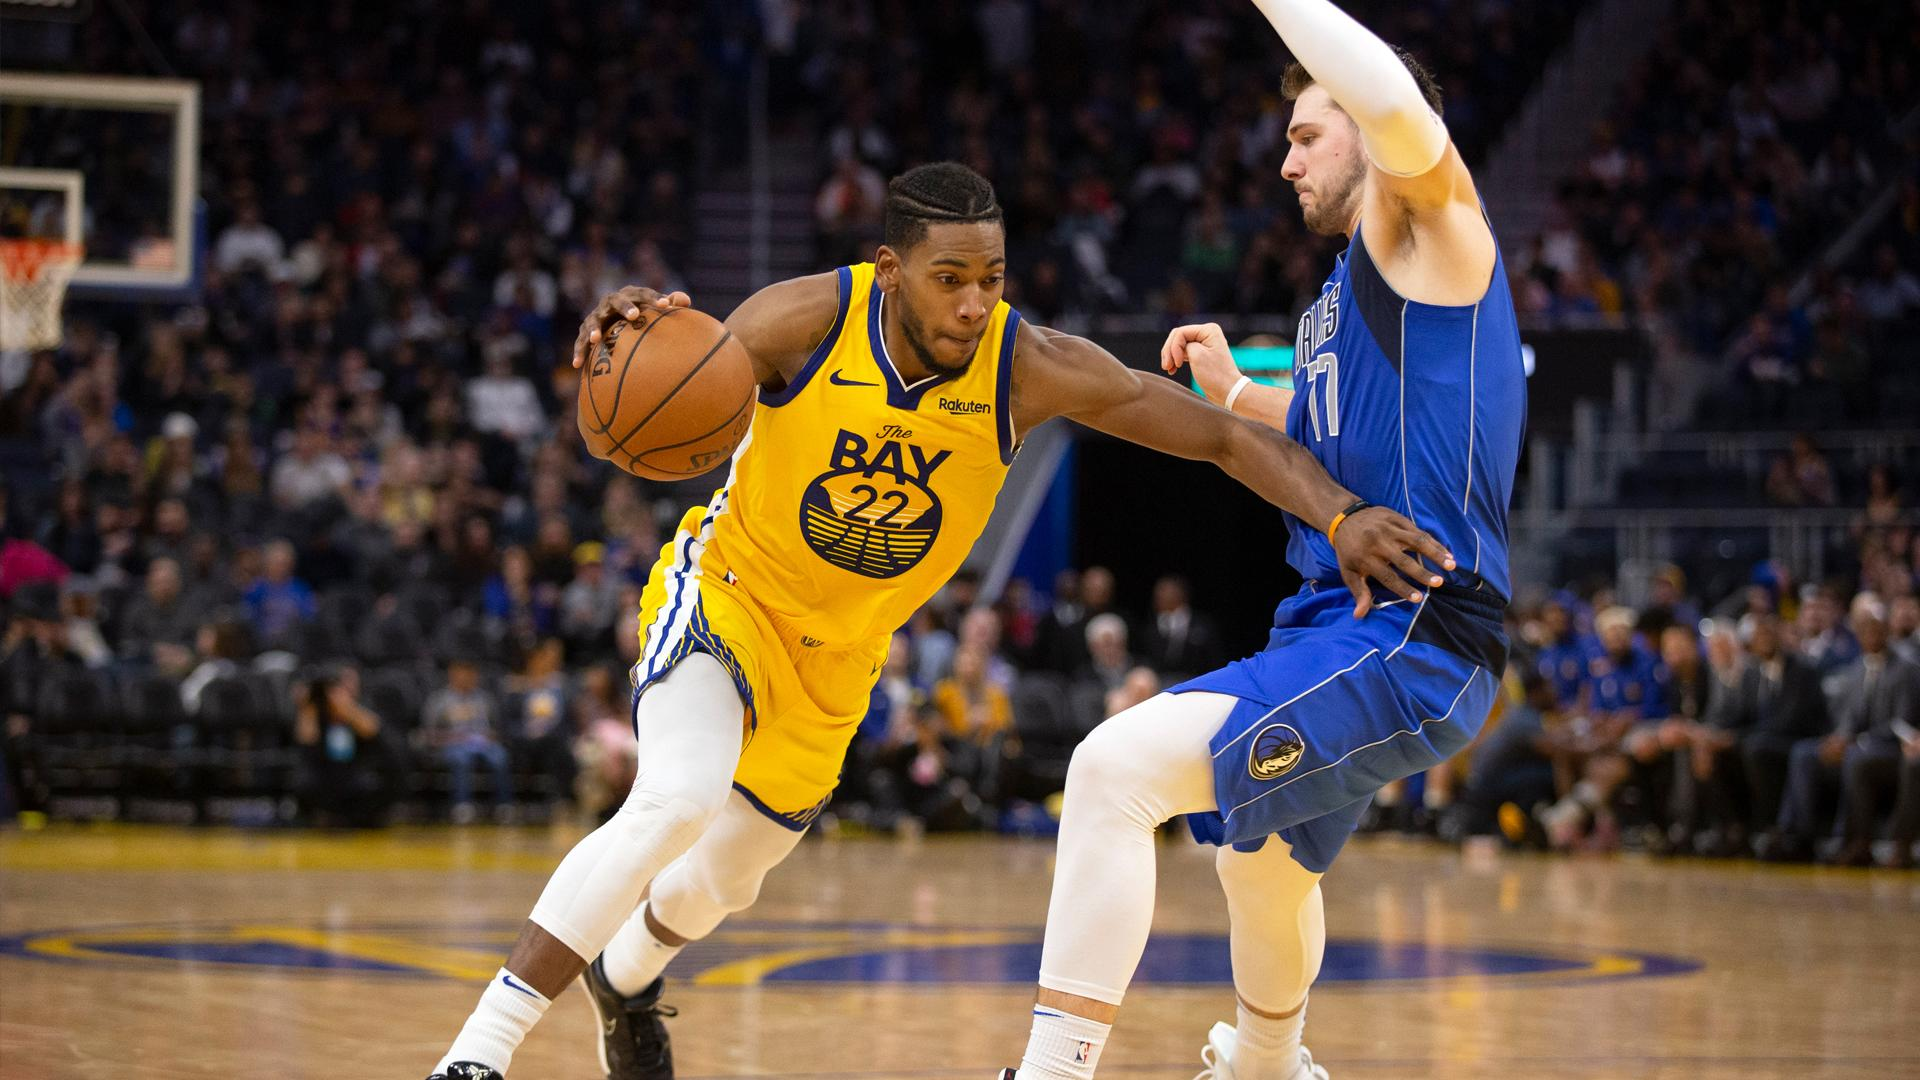 Warriors Vs Mavericks Live Stream How To Watch Nba Game